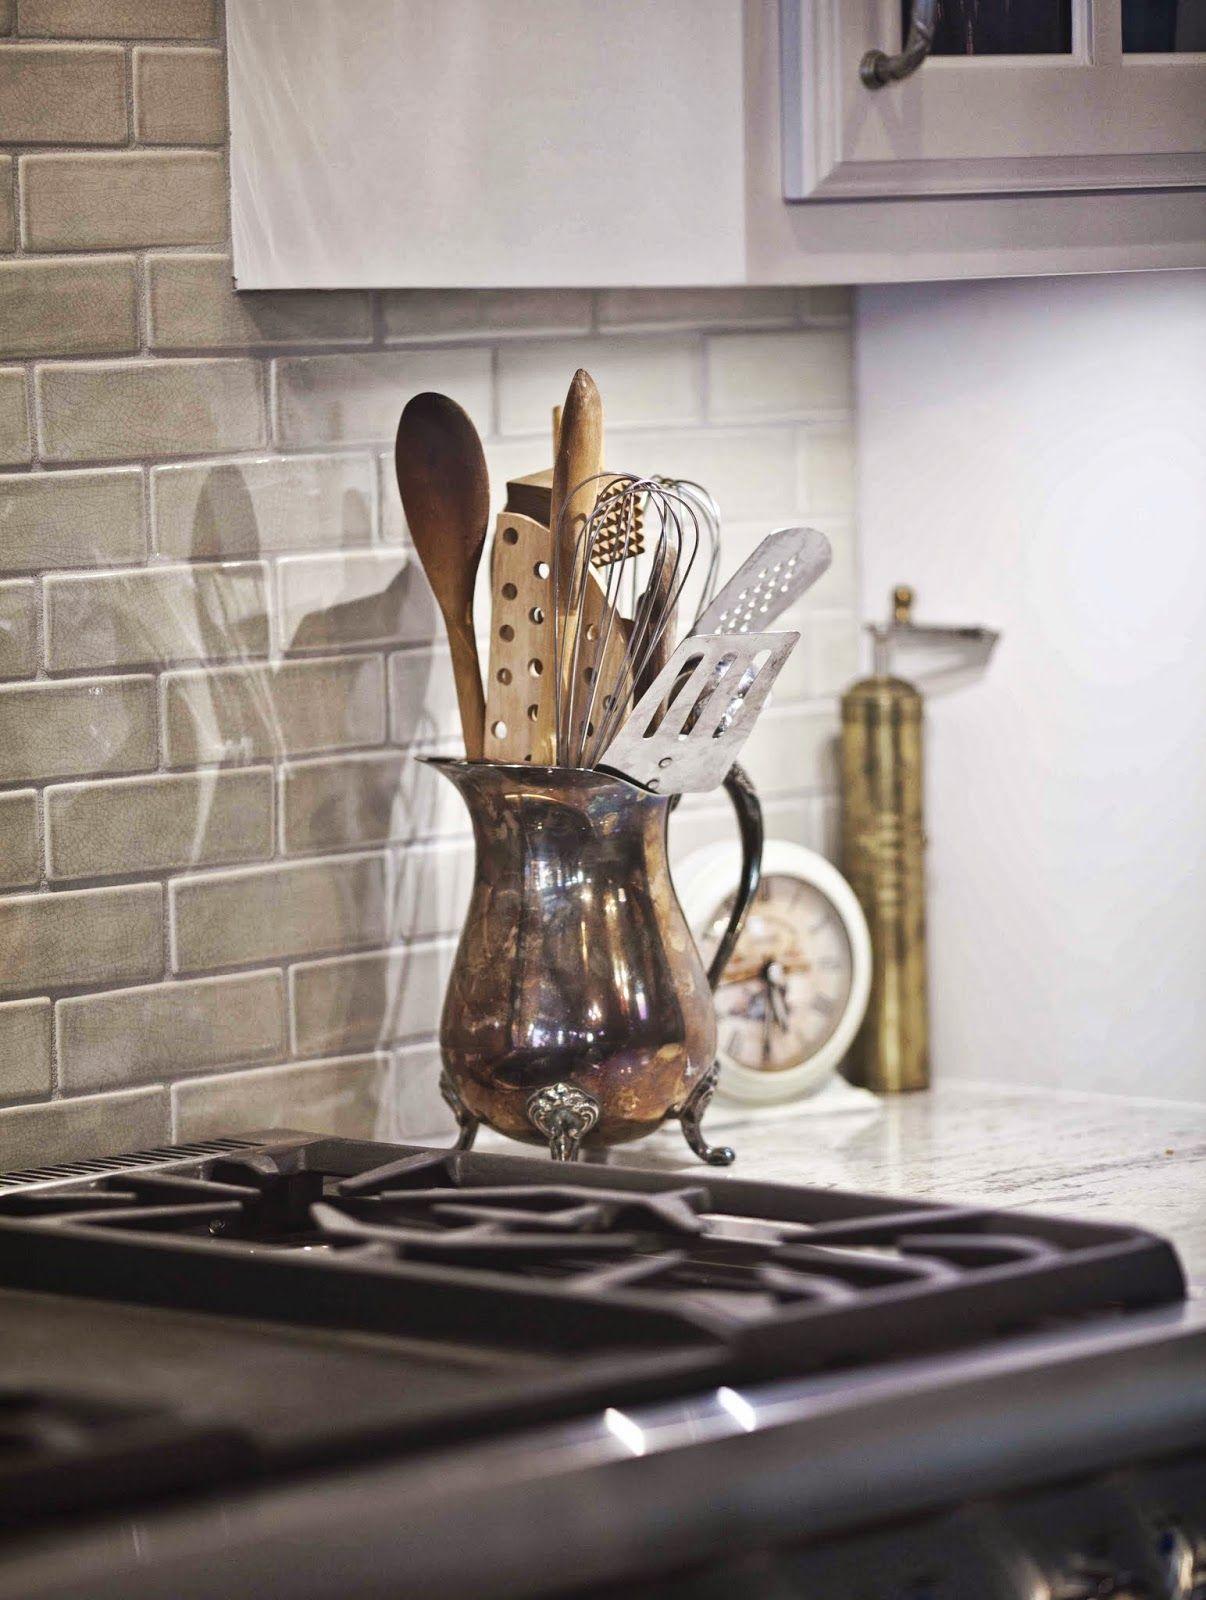 cedar hill ranch kitchen tour and confessions kitchen utensil holder country kitchen designs on farmhouse kitchen utensils id=64538